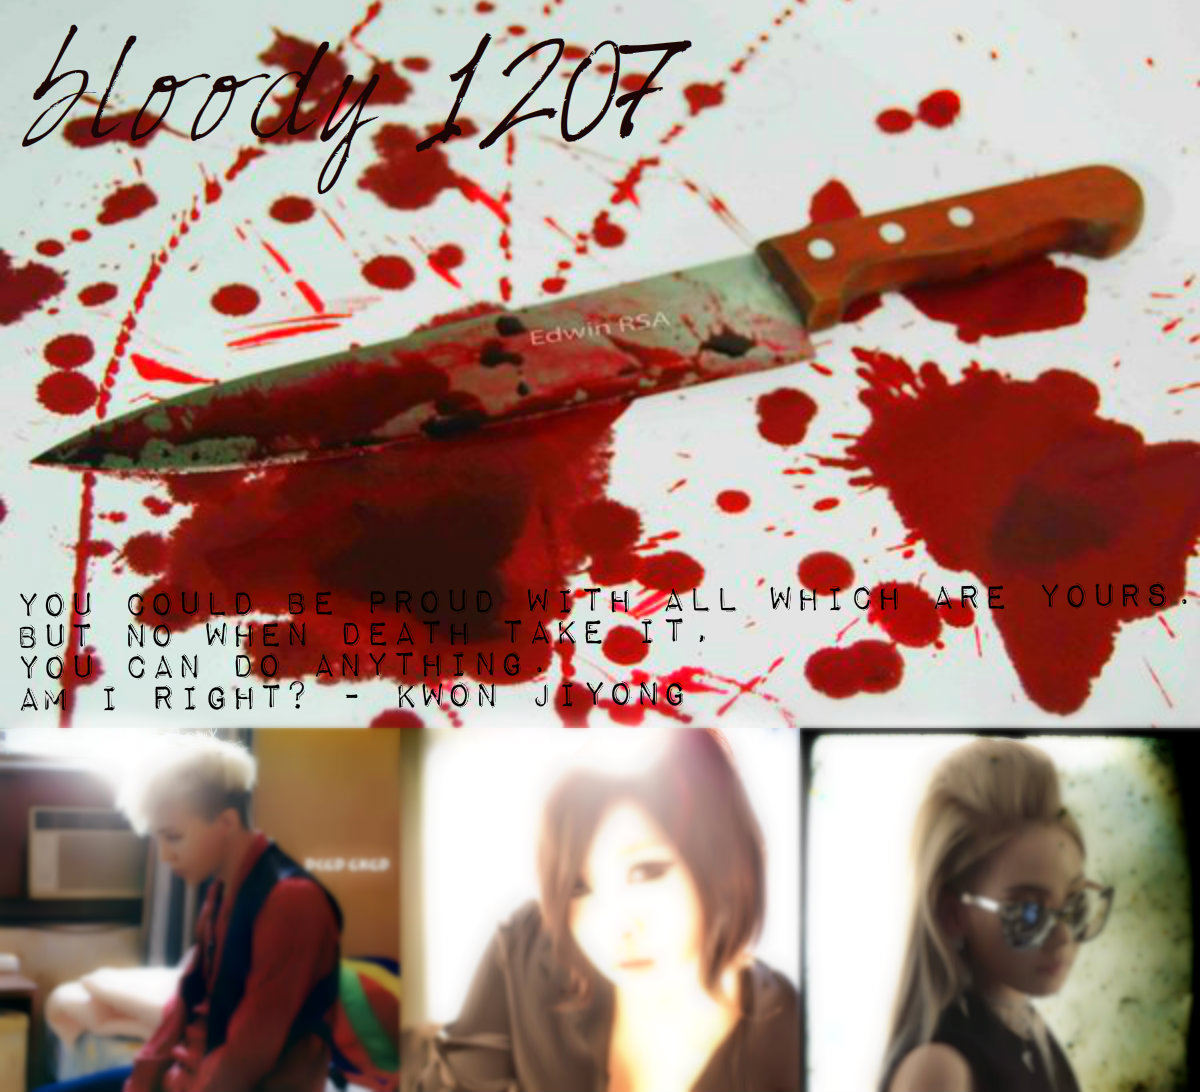 Casts: Kwon Jiyong (G Dragon BIGBANG); Jenny Kim (YG Girl).